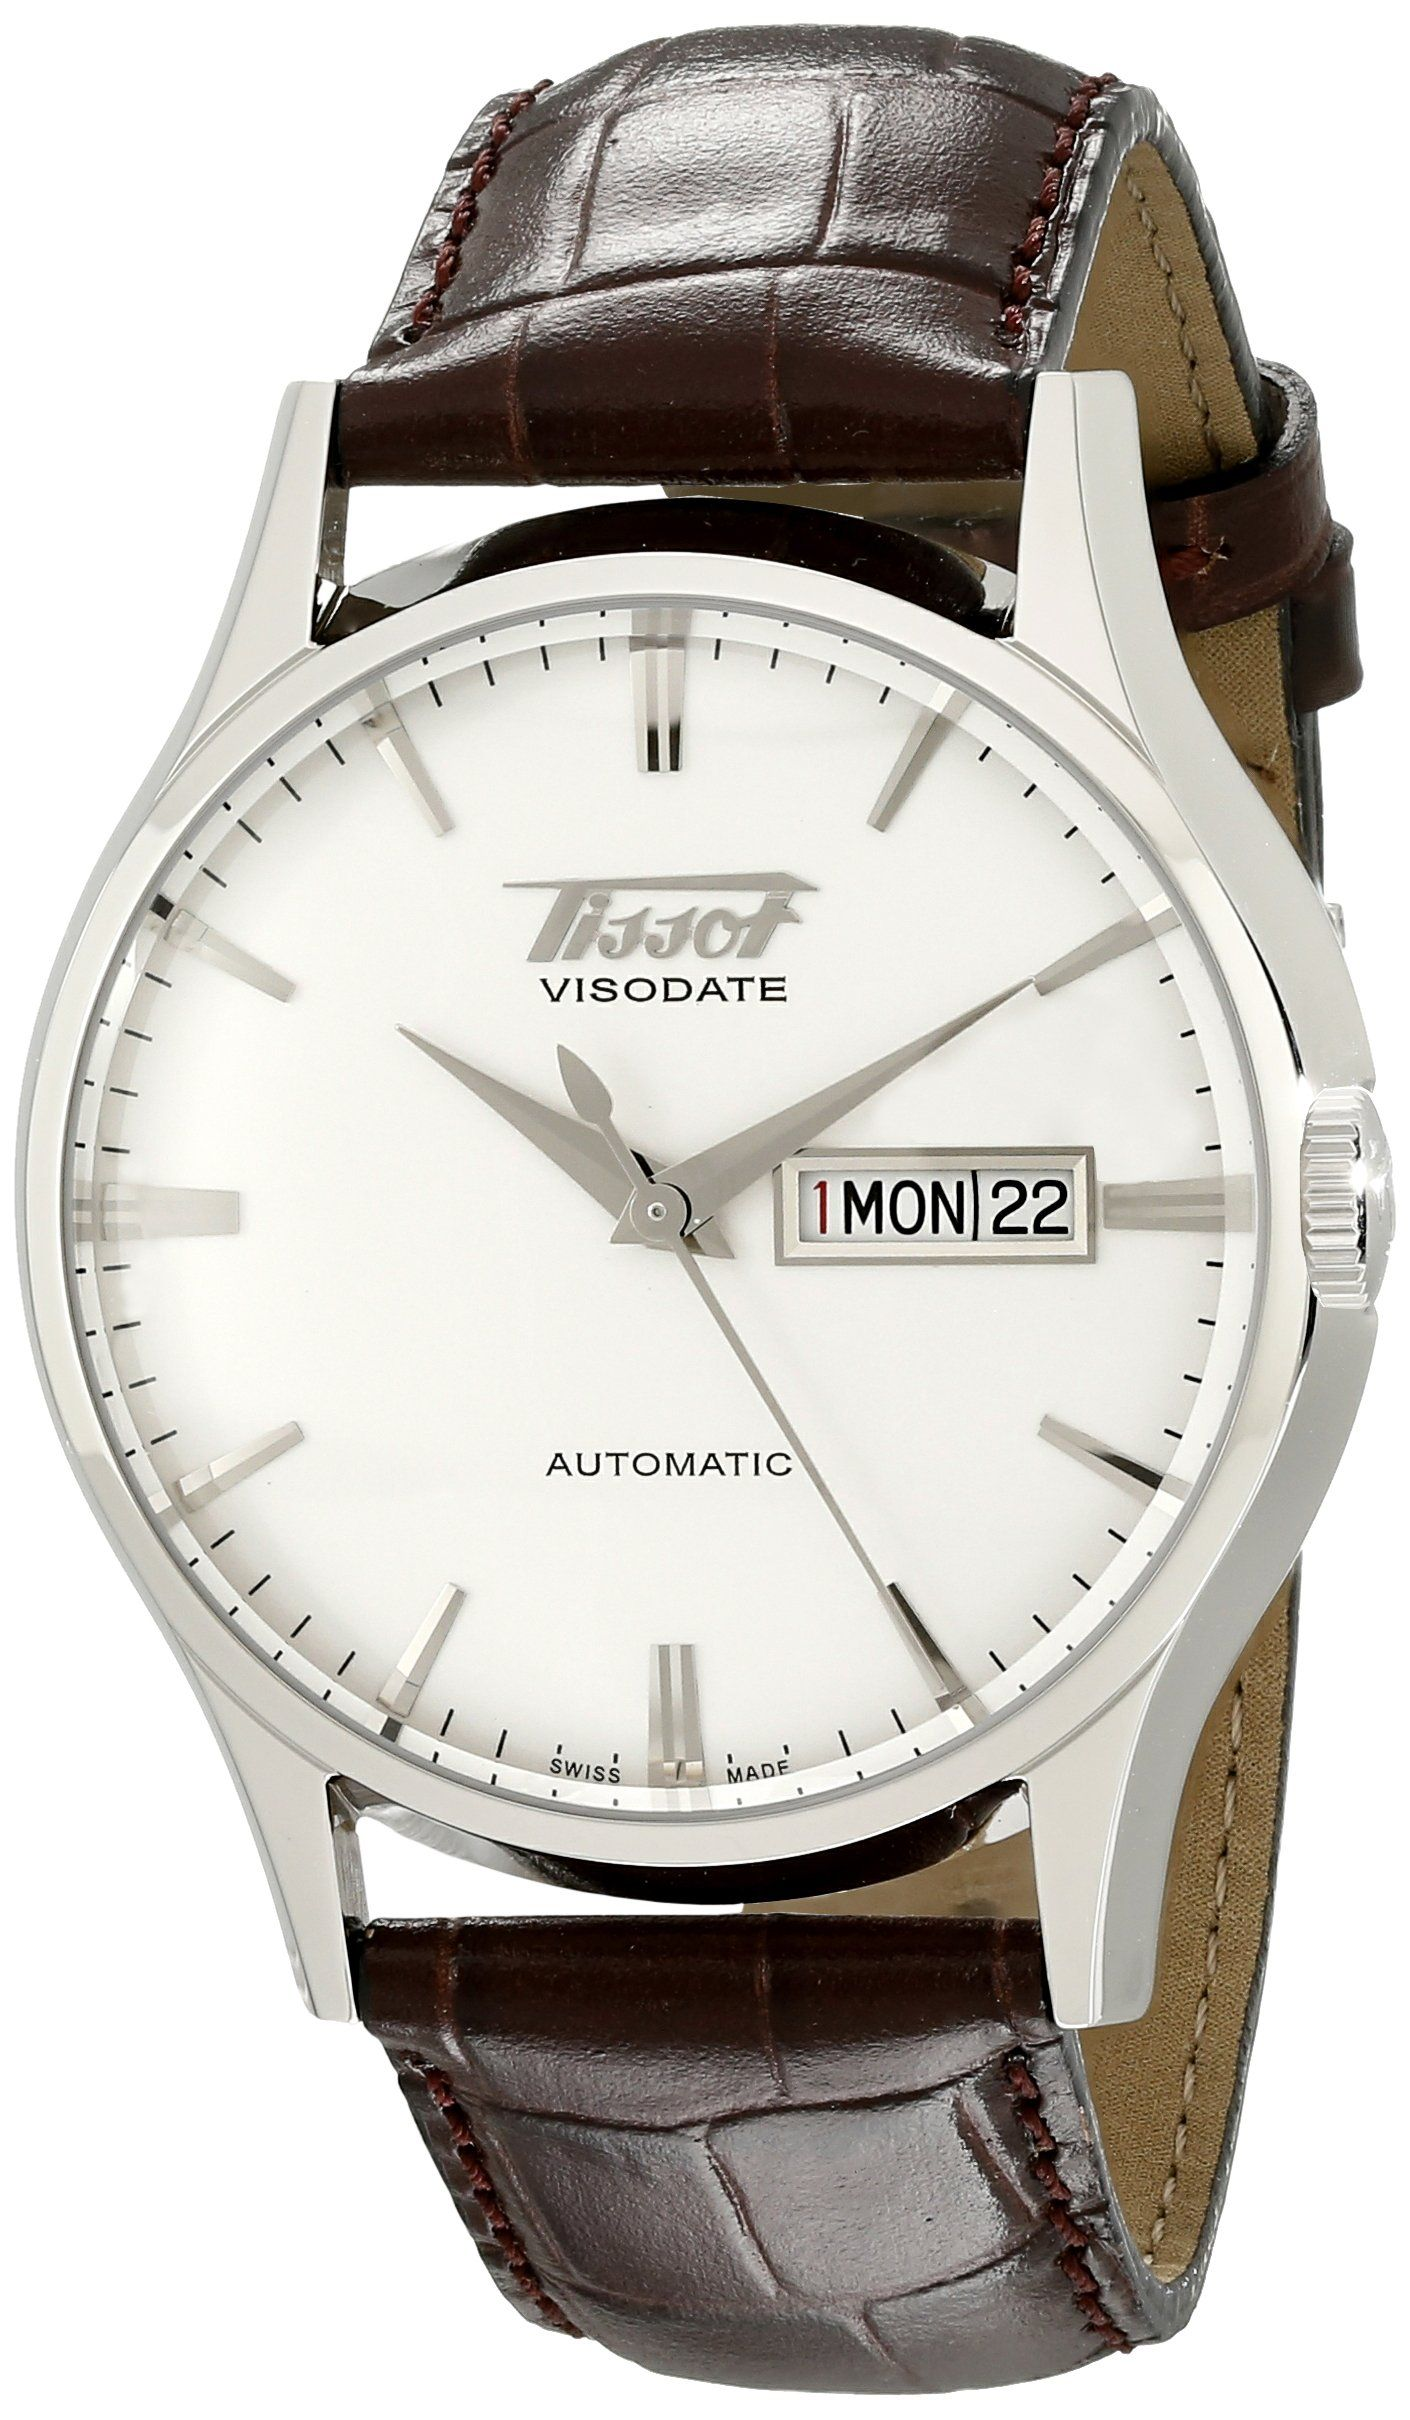 Amazon Com Tissot Men S Tist0194301603101 Heritage Visodate Analog Display Swiss Automatic Brown Watch Tissot Clothing Montre Horloge Belles Montres